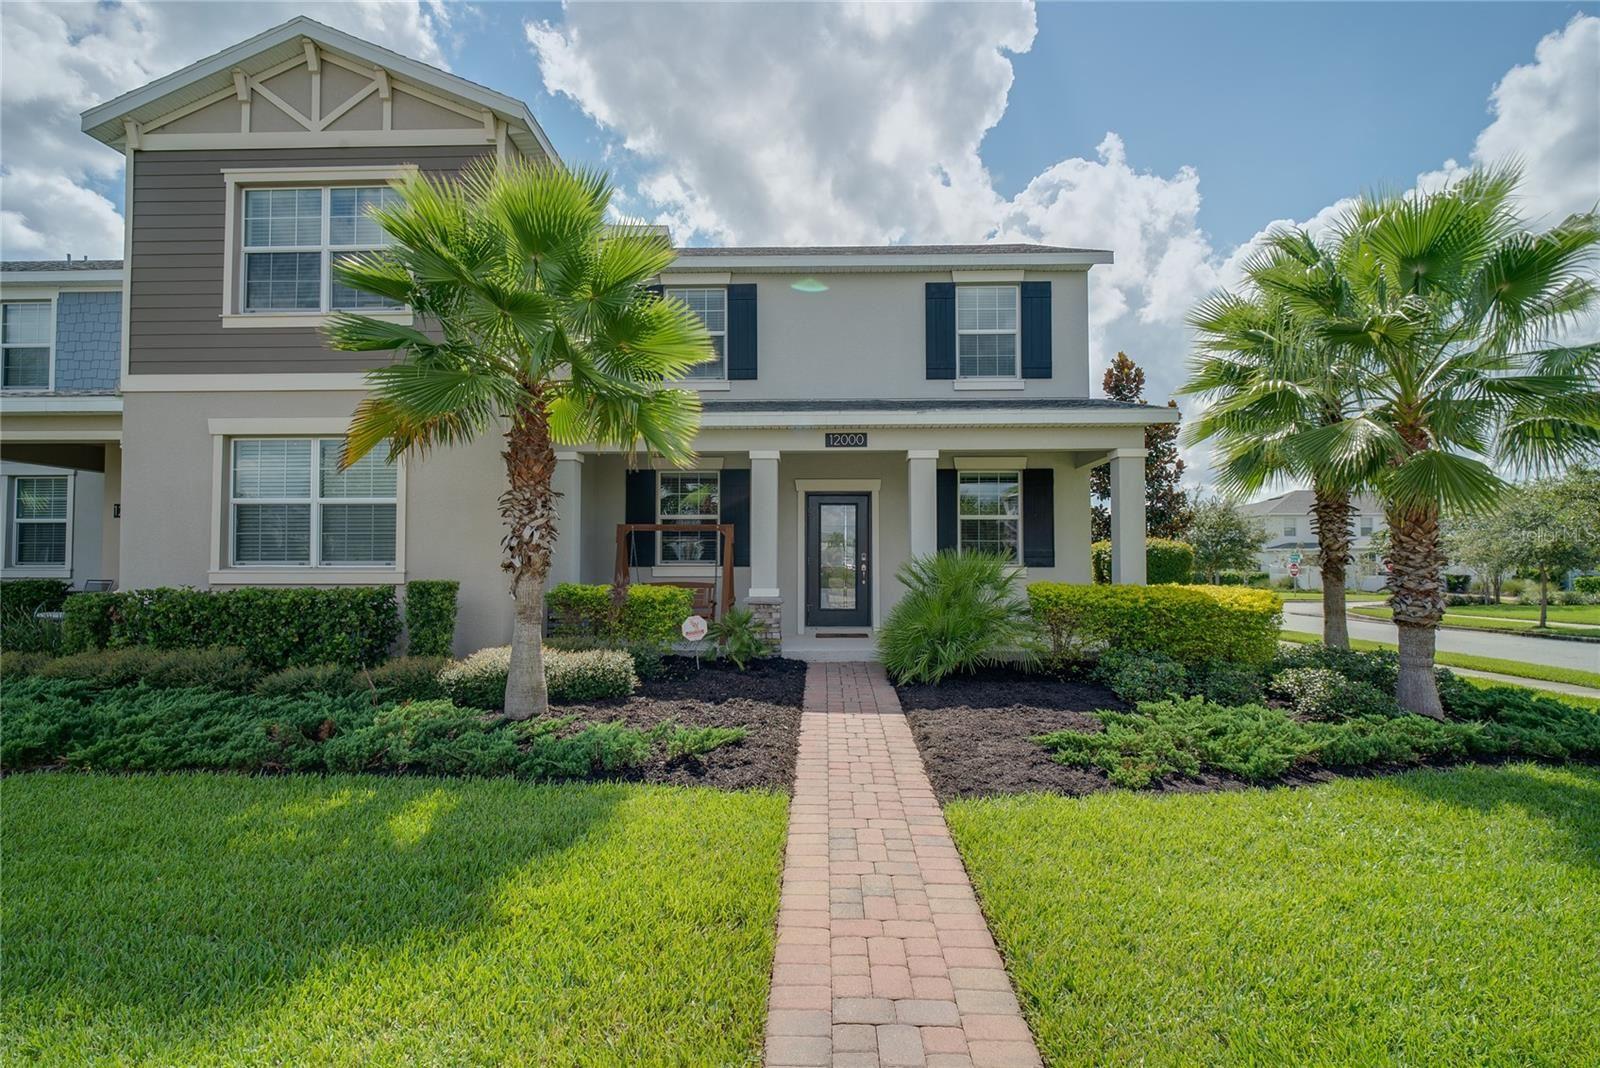 12000 SONNET AVENUE, Orlando, FL 32832 - #: O5975253